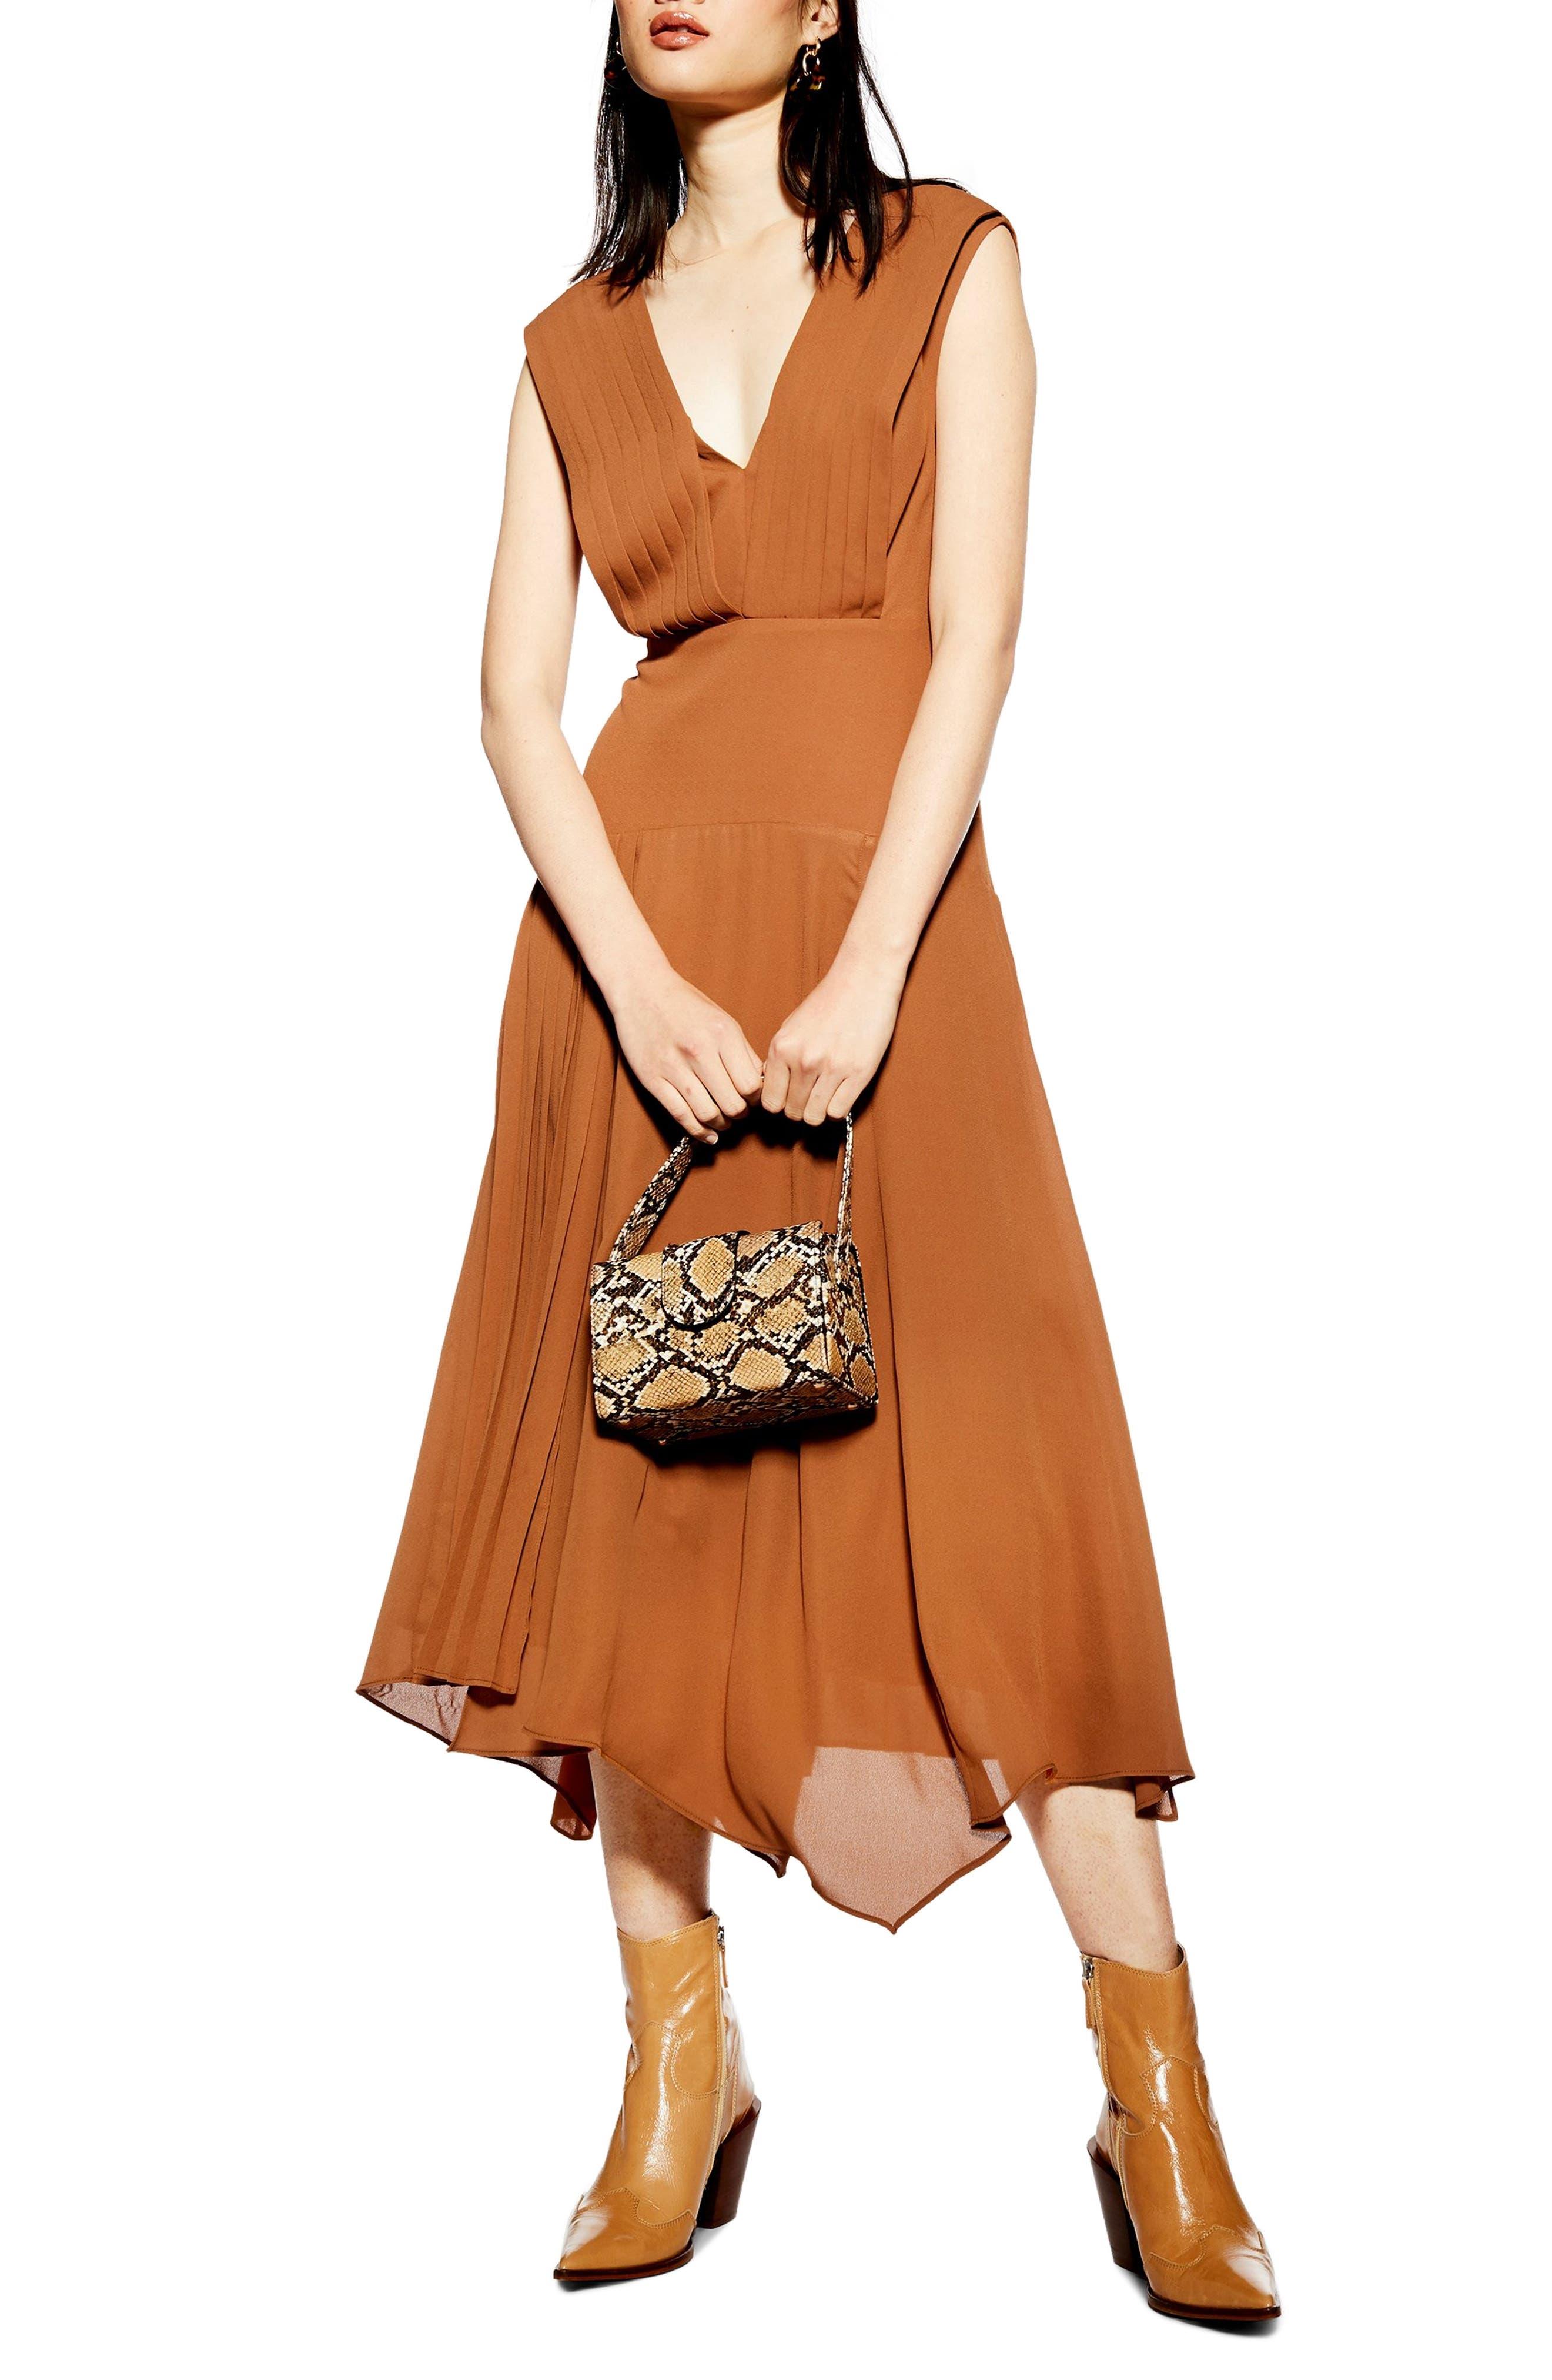 Topshop Pleated Pinafore Midi Dress, US (fits like 2-4) - Brown